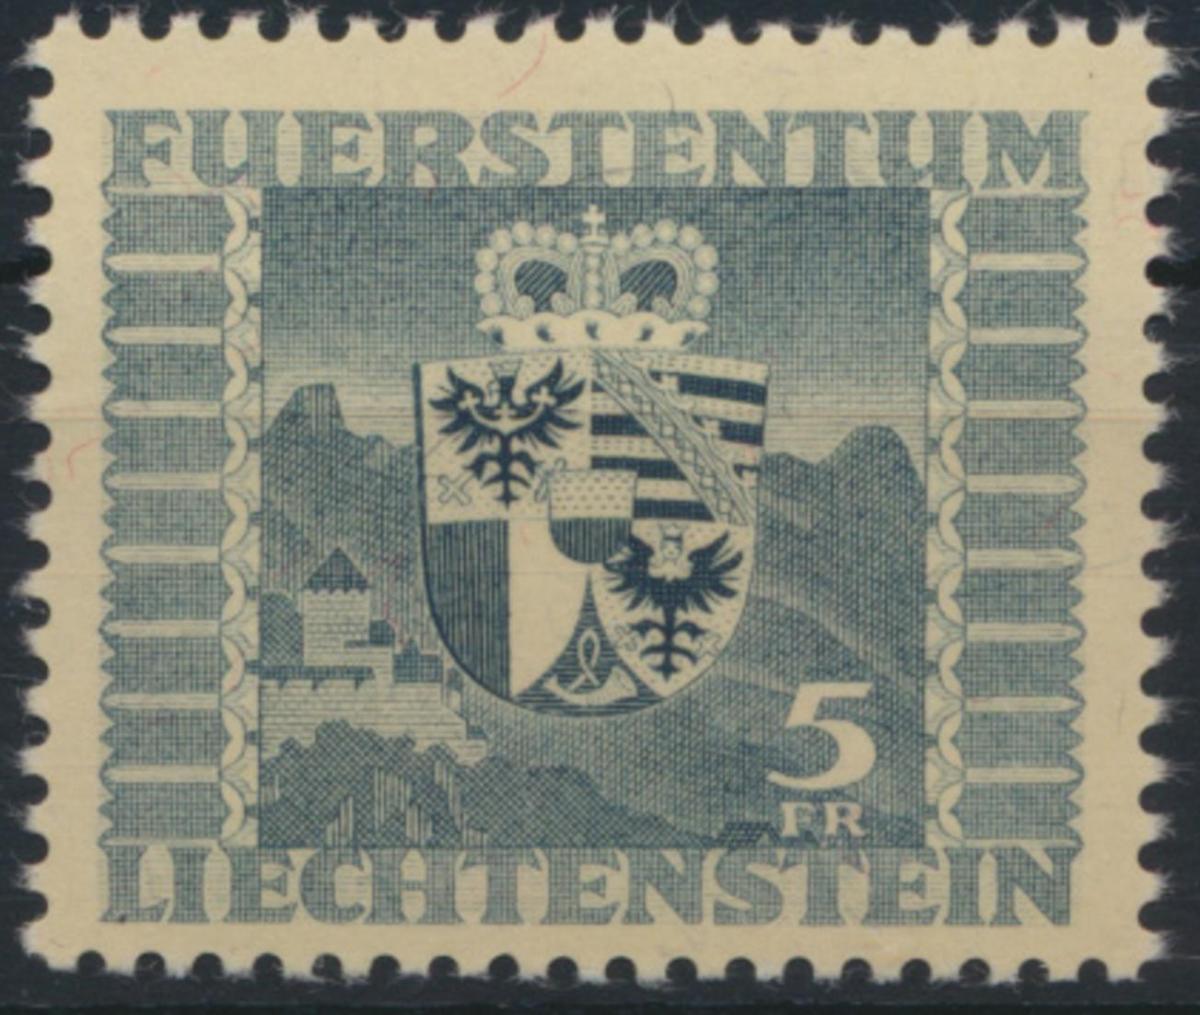 Liechtenstein 243 Wappen Ausgabe 1945 tadellos postfrisch MNH